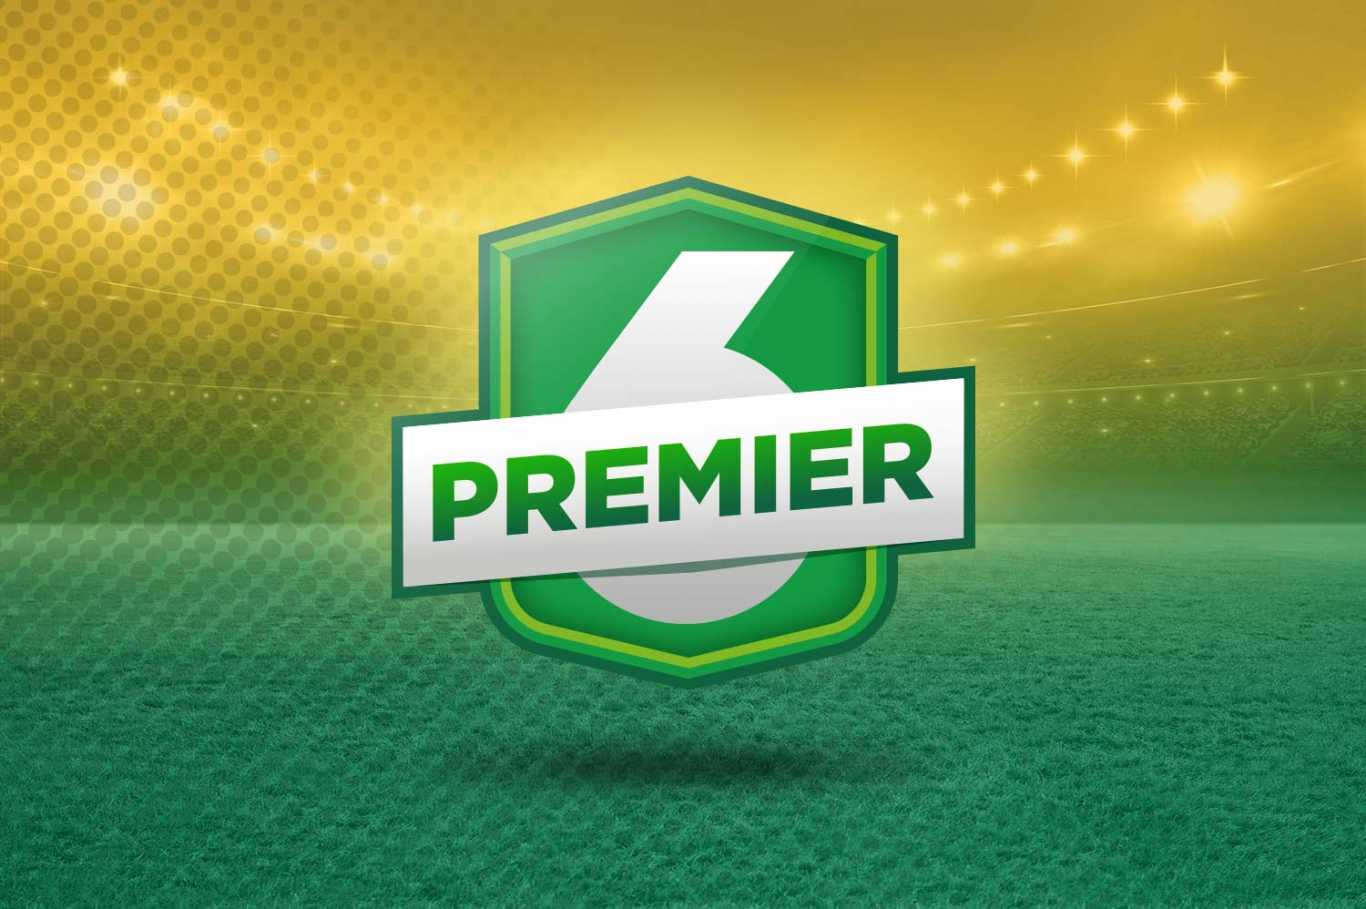 Premier betting ghana odds minecraft neuerungen 1-3 2-4 betting system